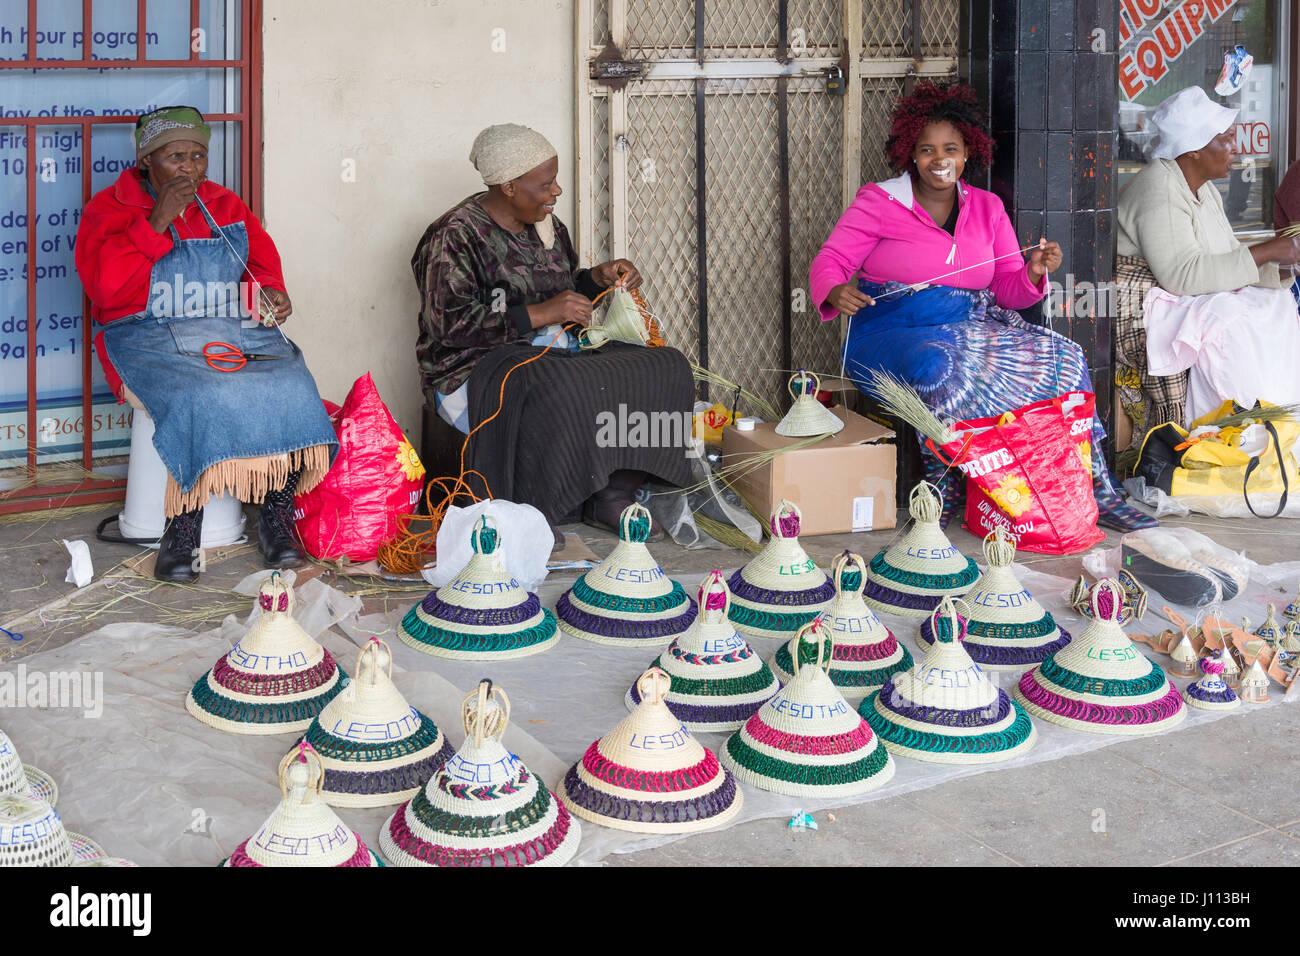 Street Bosotho hat weavers, Kingsway, Maseru, Maseru District, Kingdom of Lesotho - Stock Image